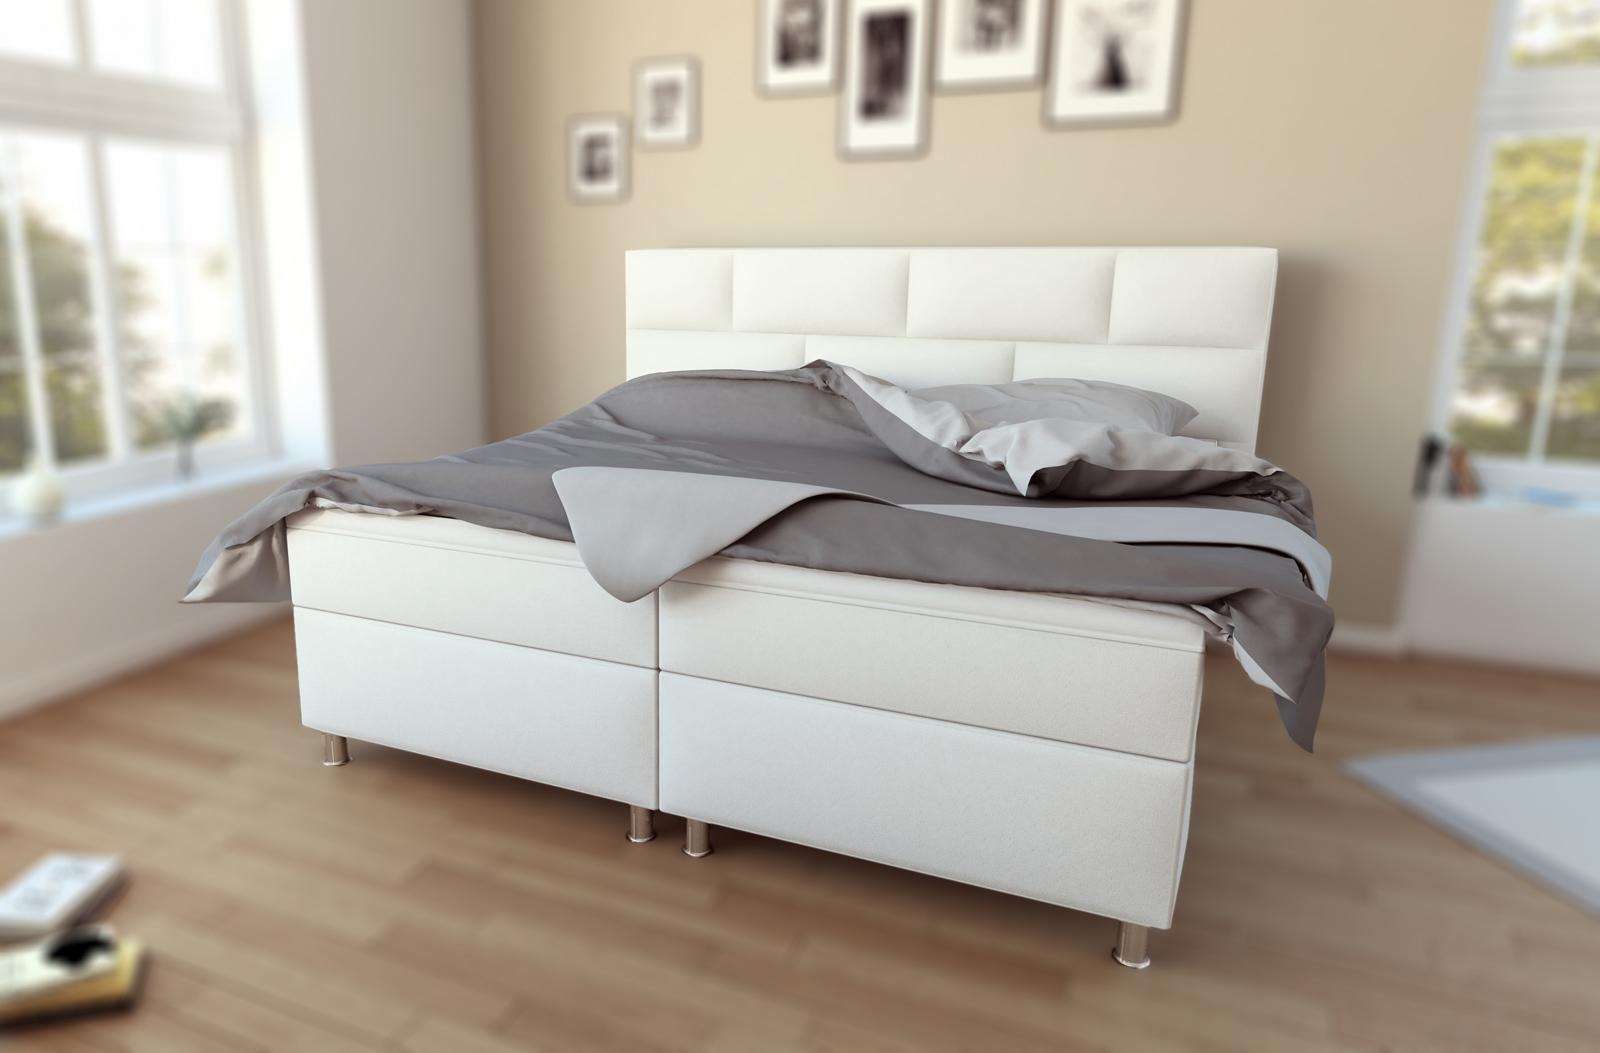 sam boxspringbett hotelbett doppelbett 180 x 200 cm wei olivia. Black Bedroom Furniture Sets. Home Design Ideas